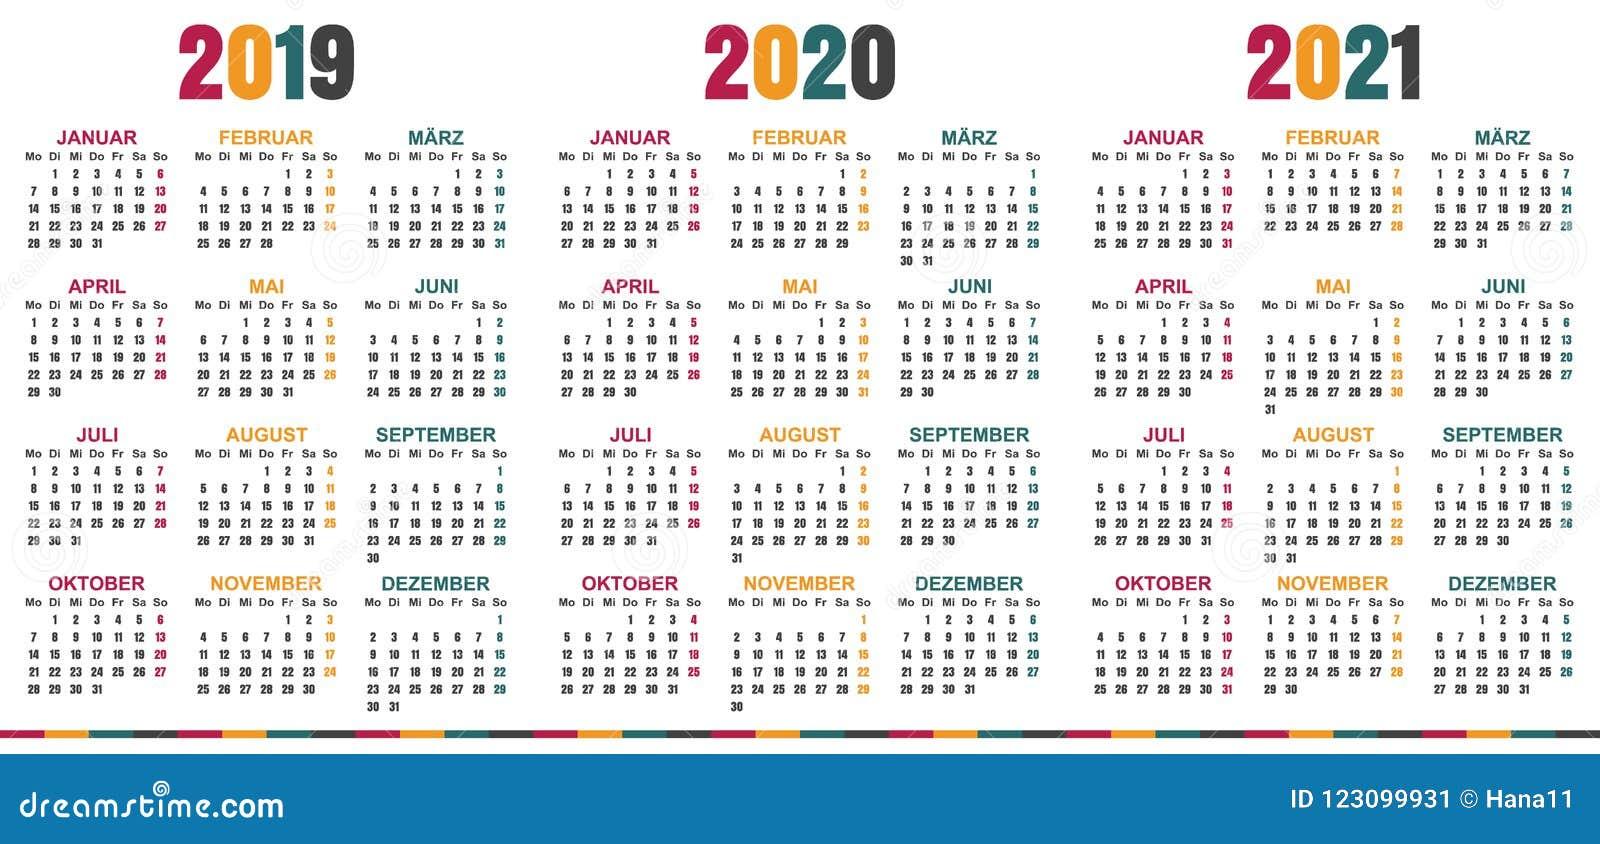 german calendar 2019 2021